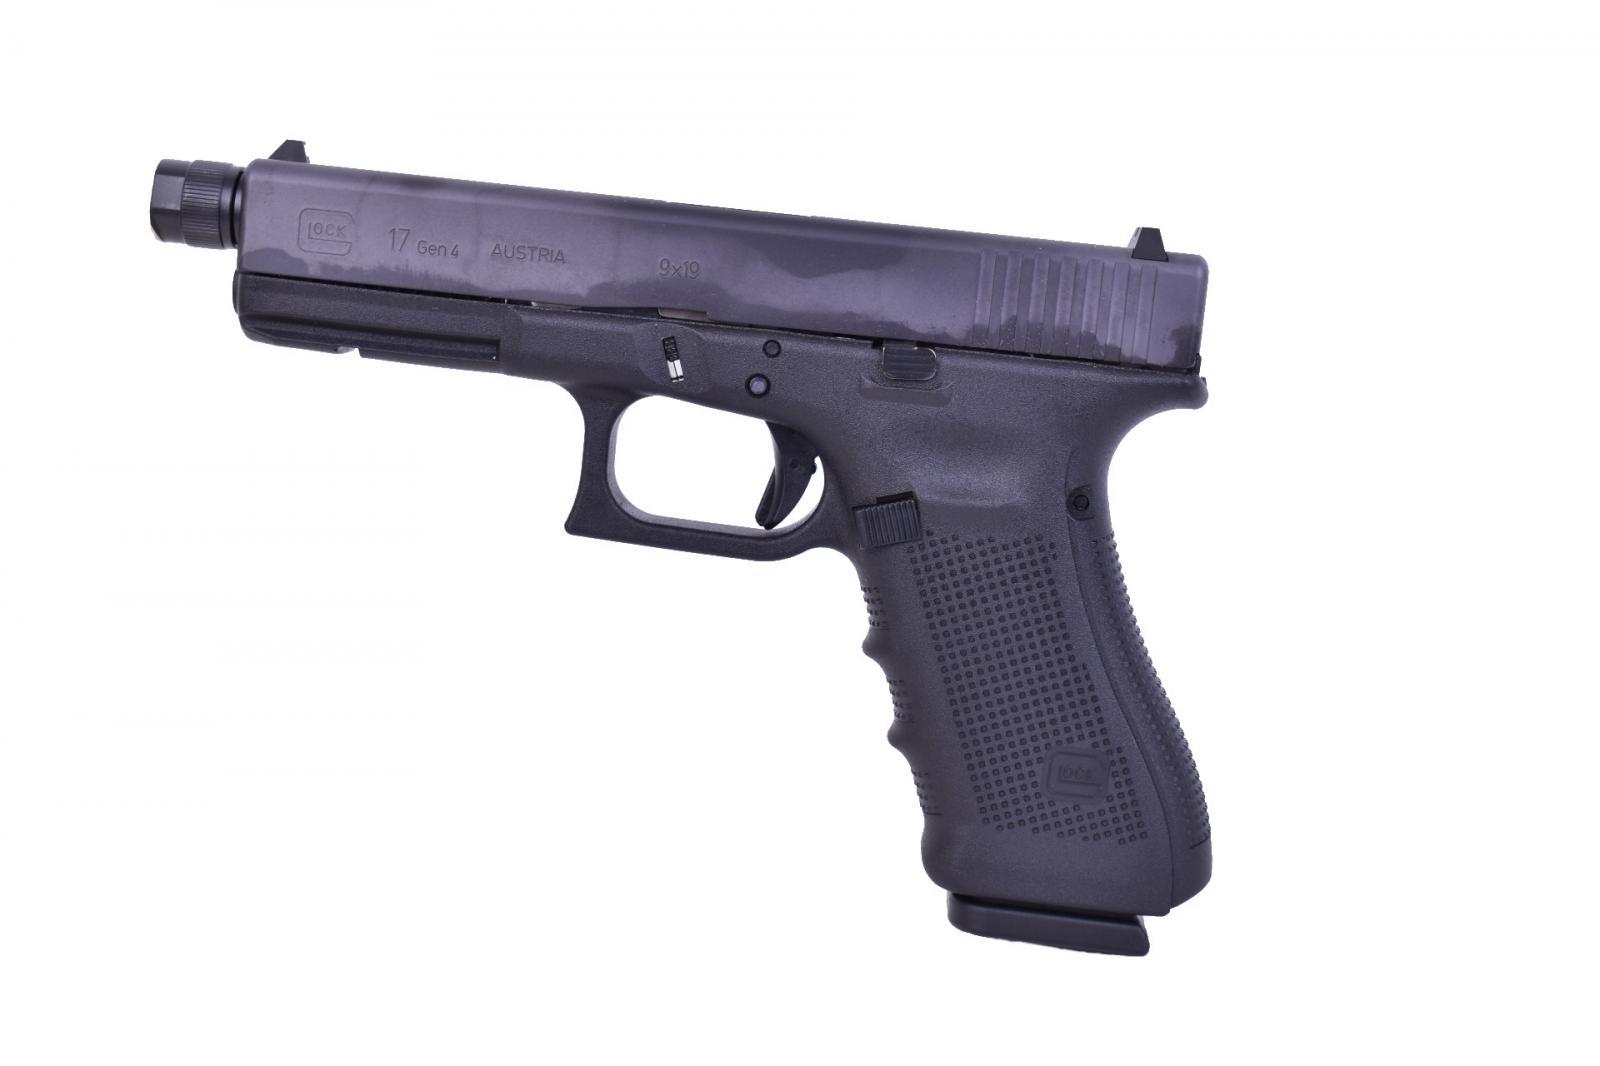 Pistolet GLOCK 17 GEN 4 Fileté Cal. 9x19 mm